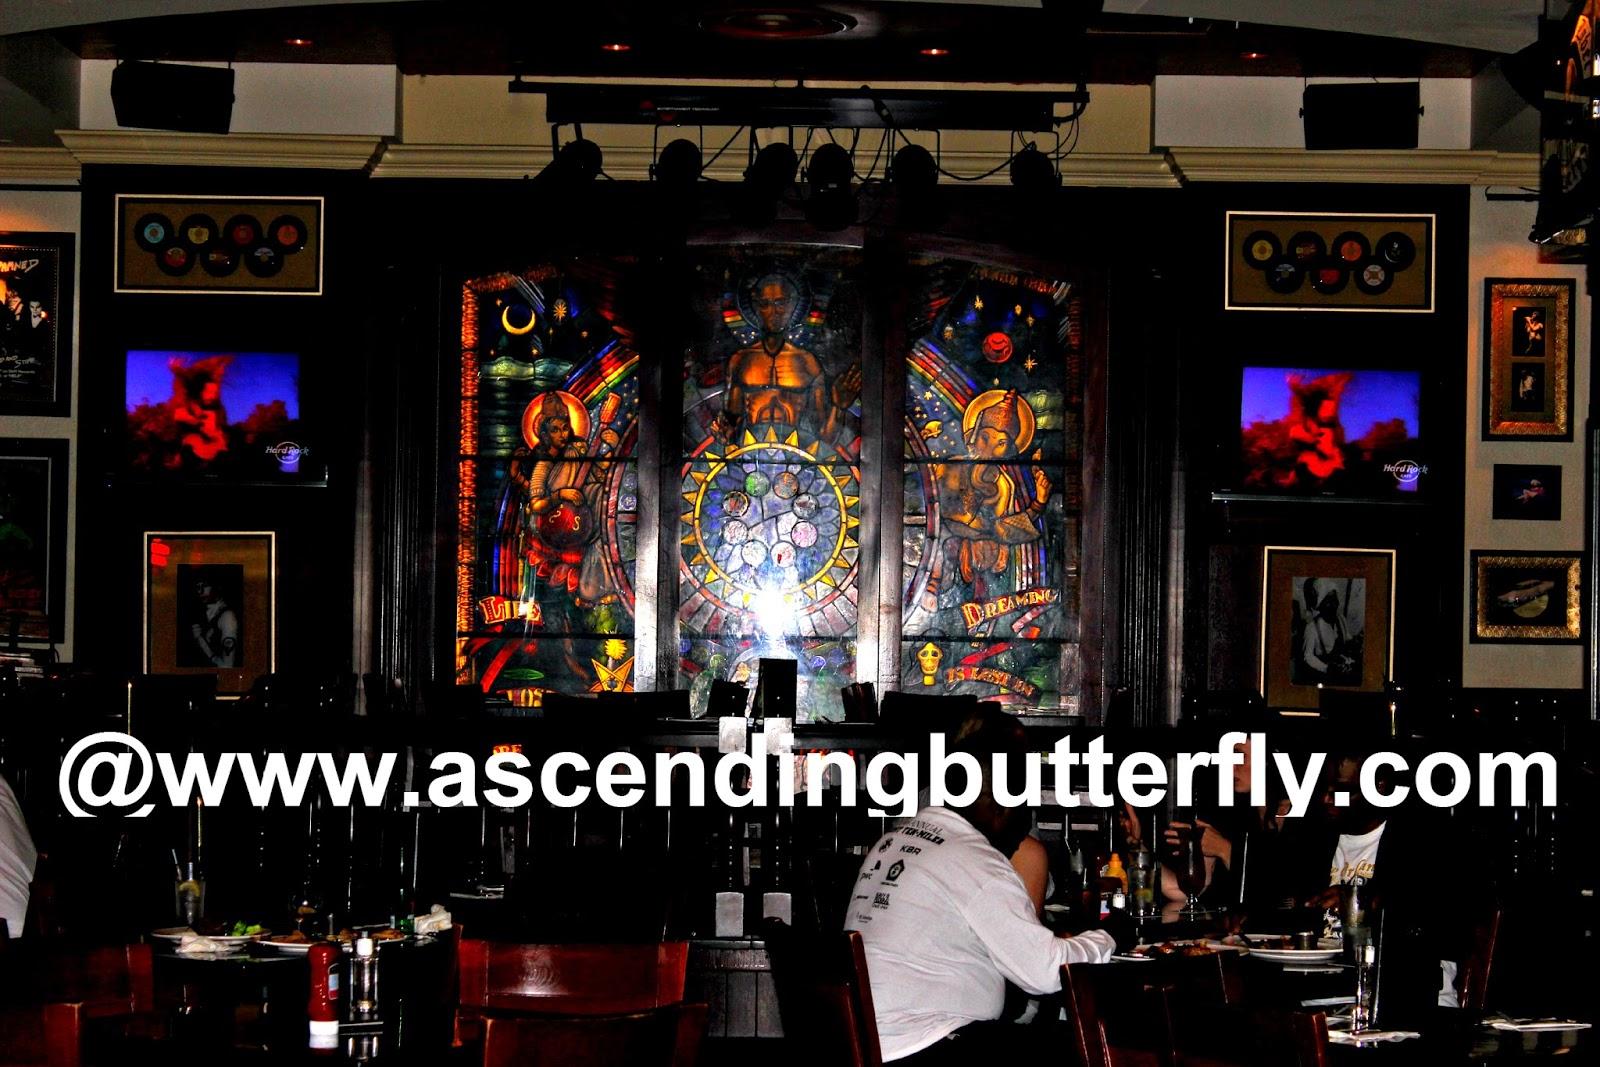 Hard Rock Taj Mahal, #DOACNightlife Bus, Party Bus, Atlantic City, Visit AC, Atlantic City Alliance, DO AC, DO AC Nightlife